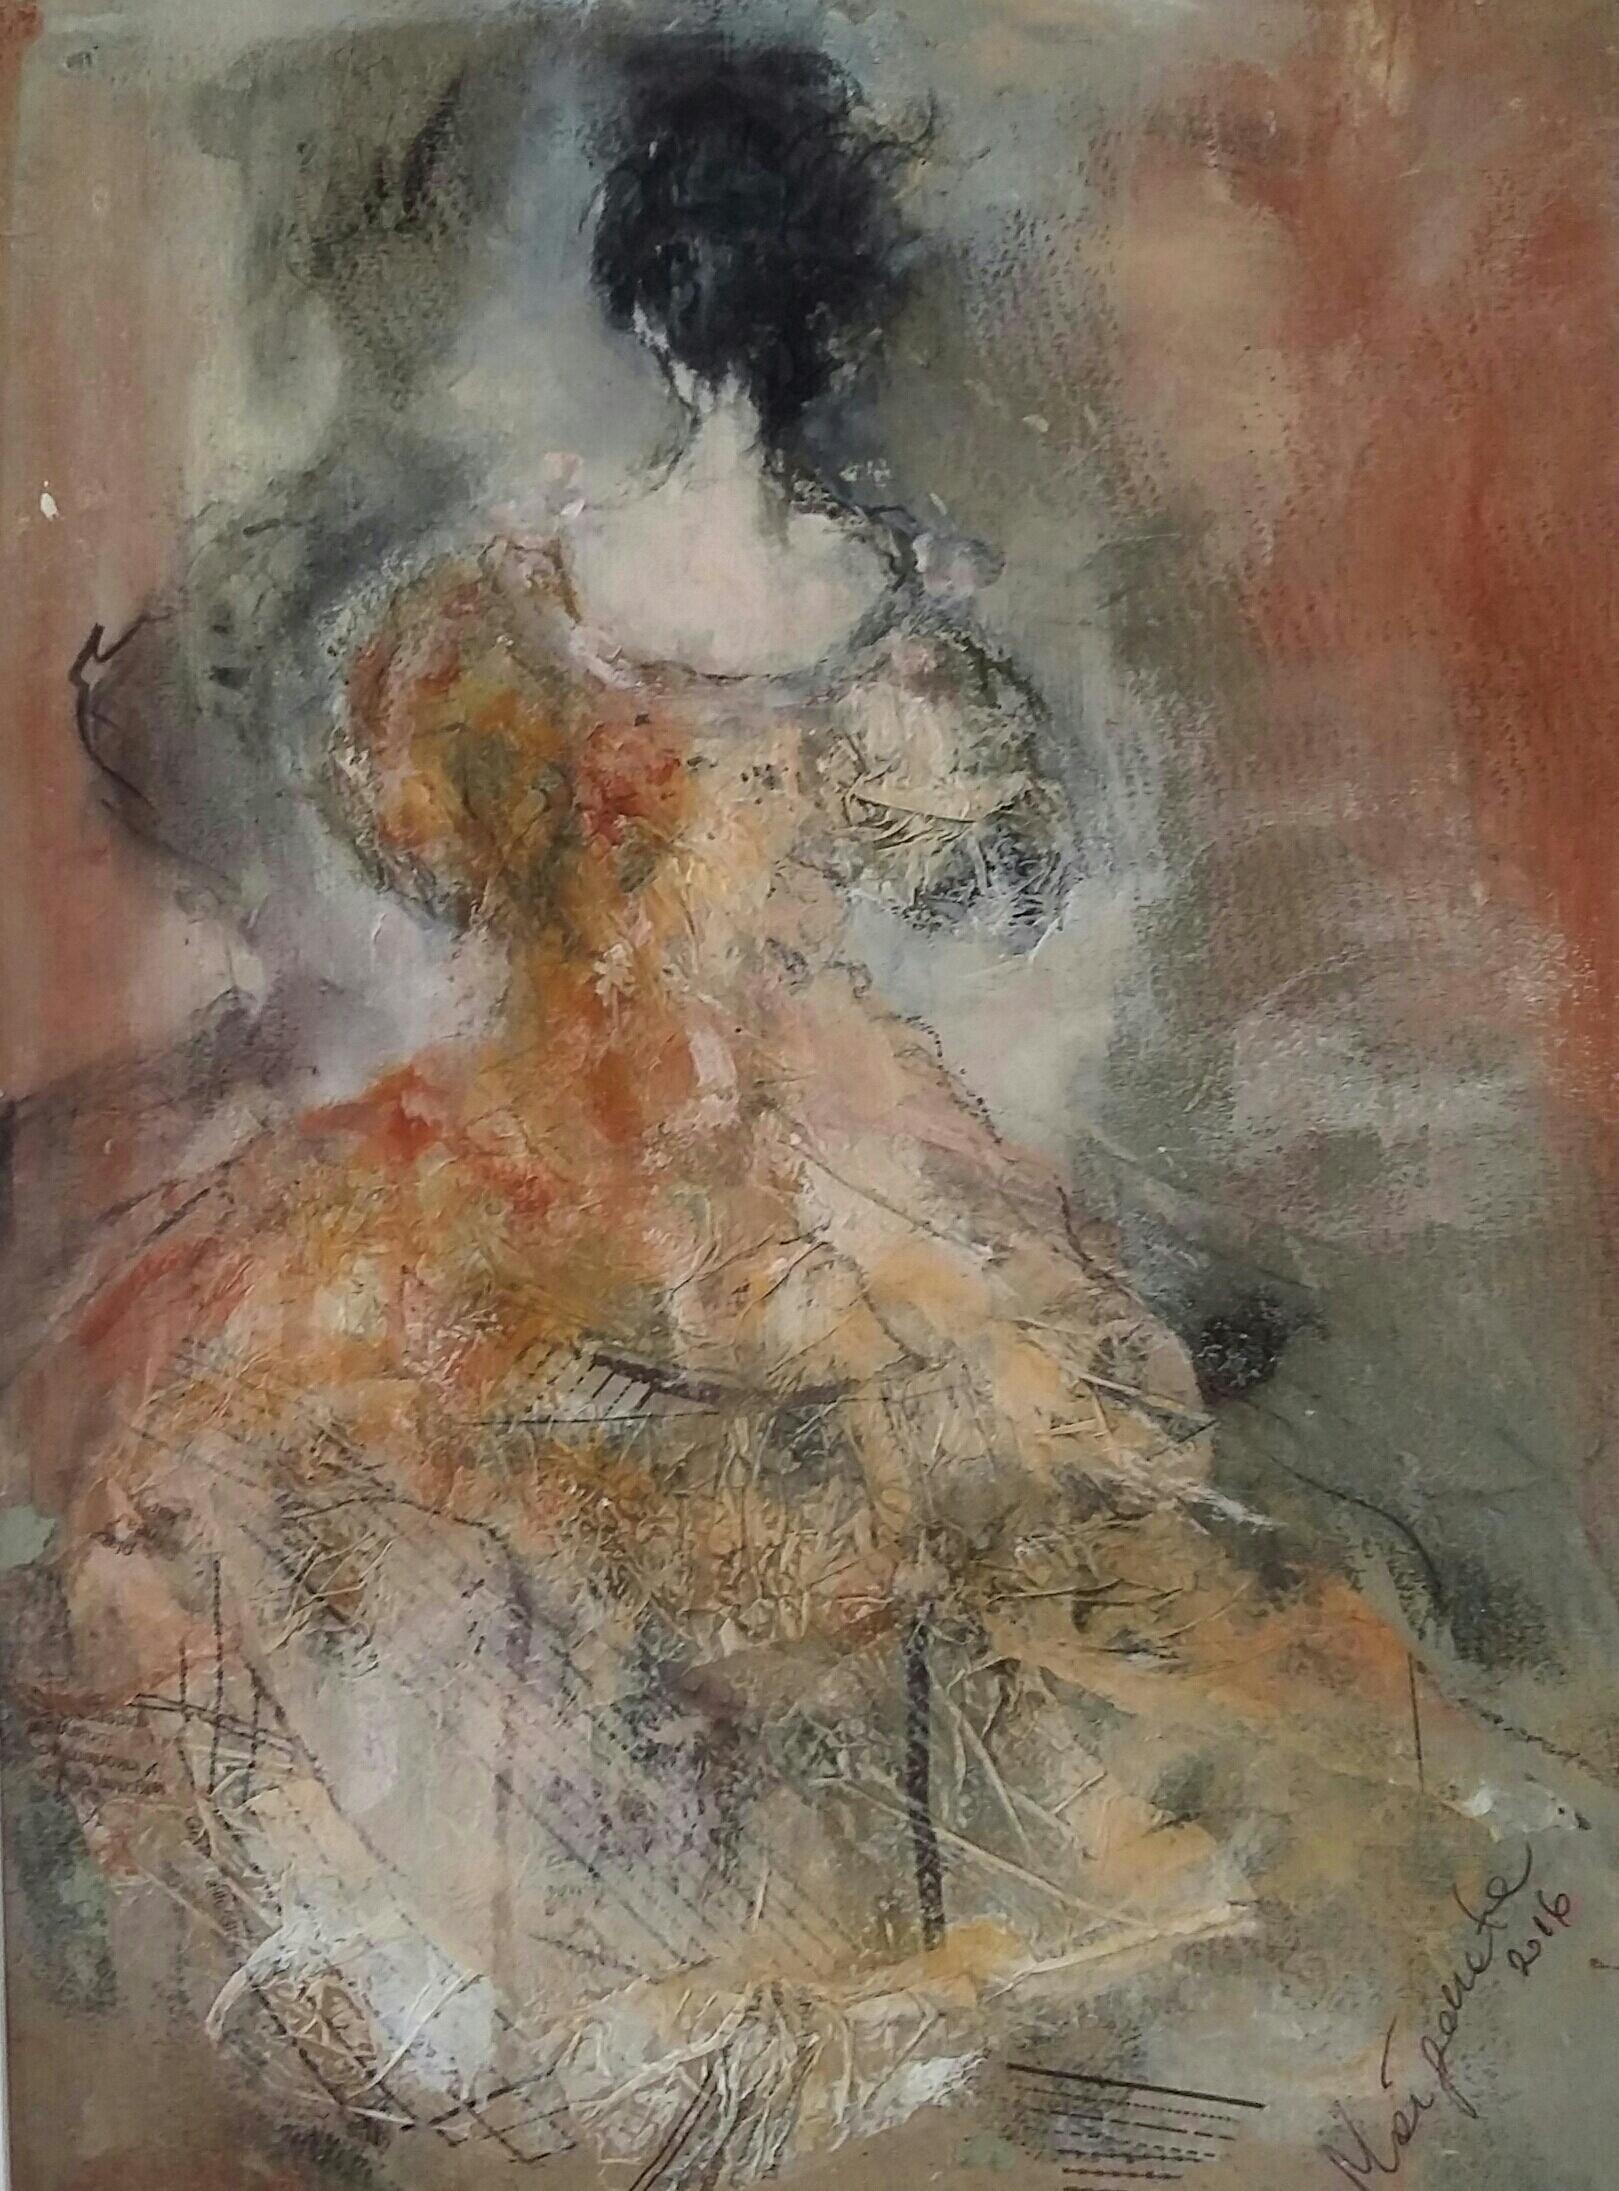 """Femme I"" 30x40 cm, Acryl auf altem Papier, Collage - verkauft -"